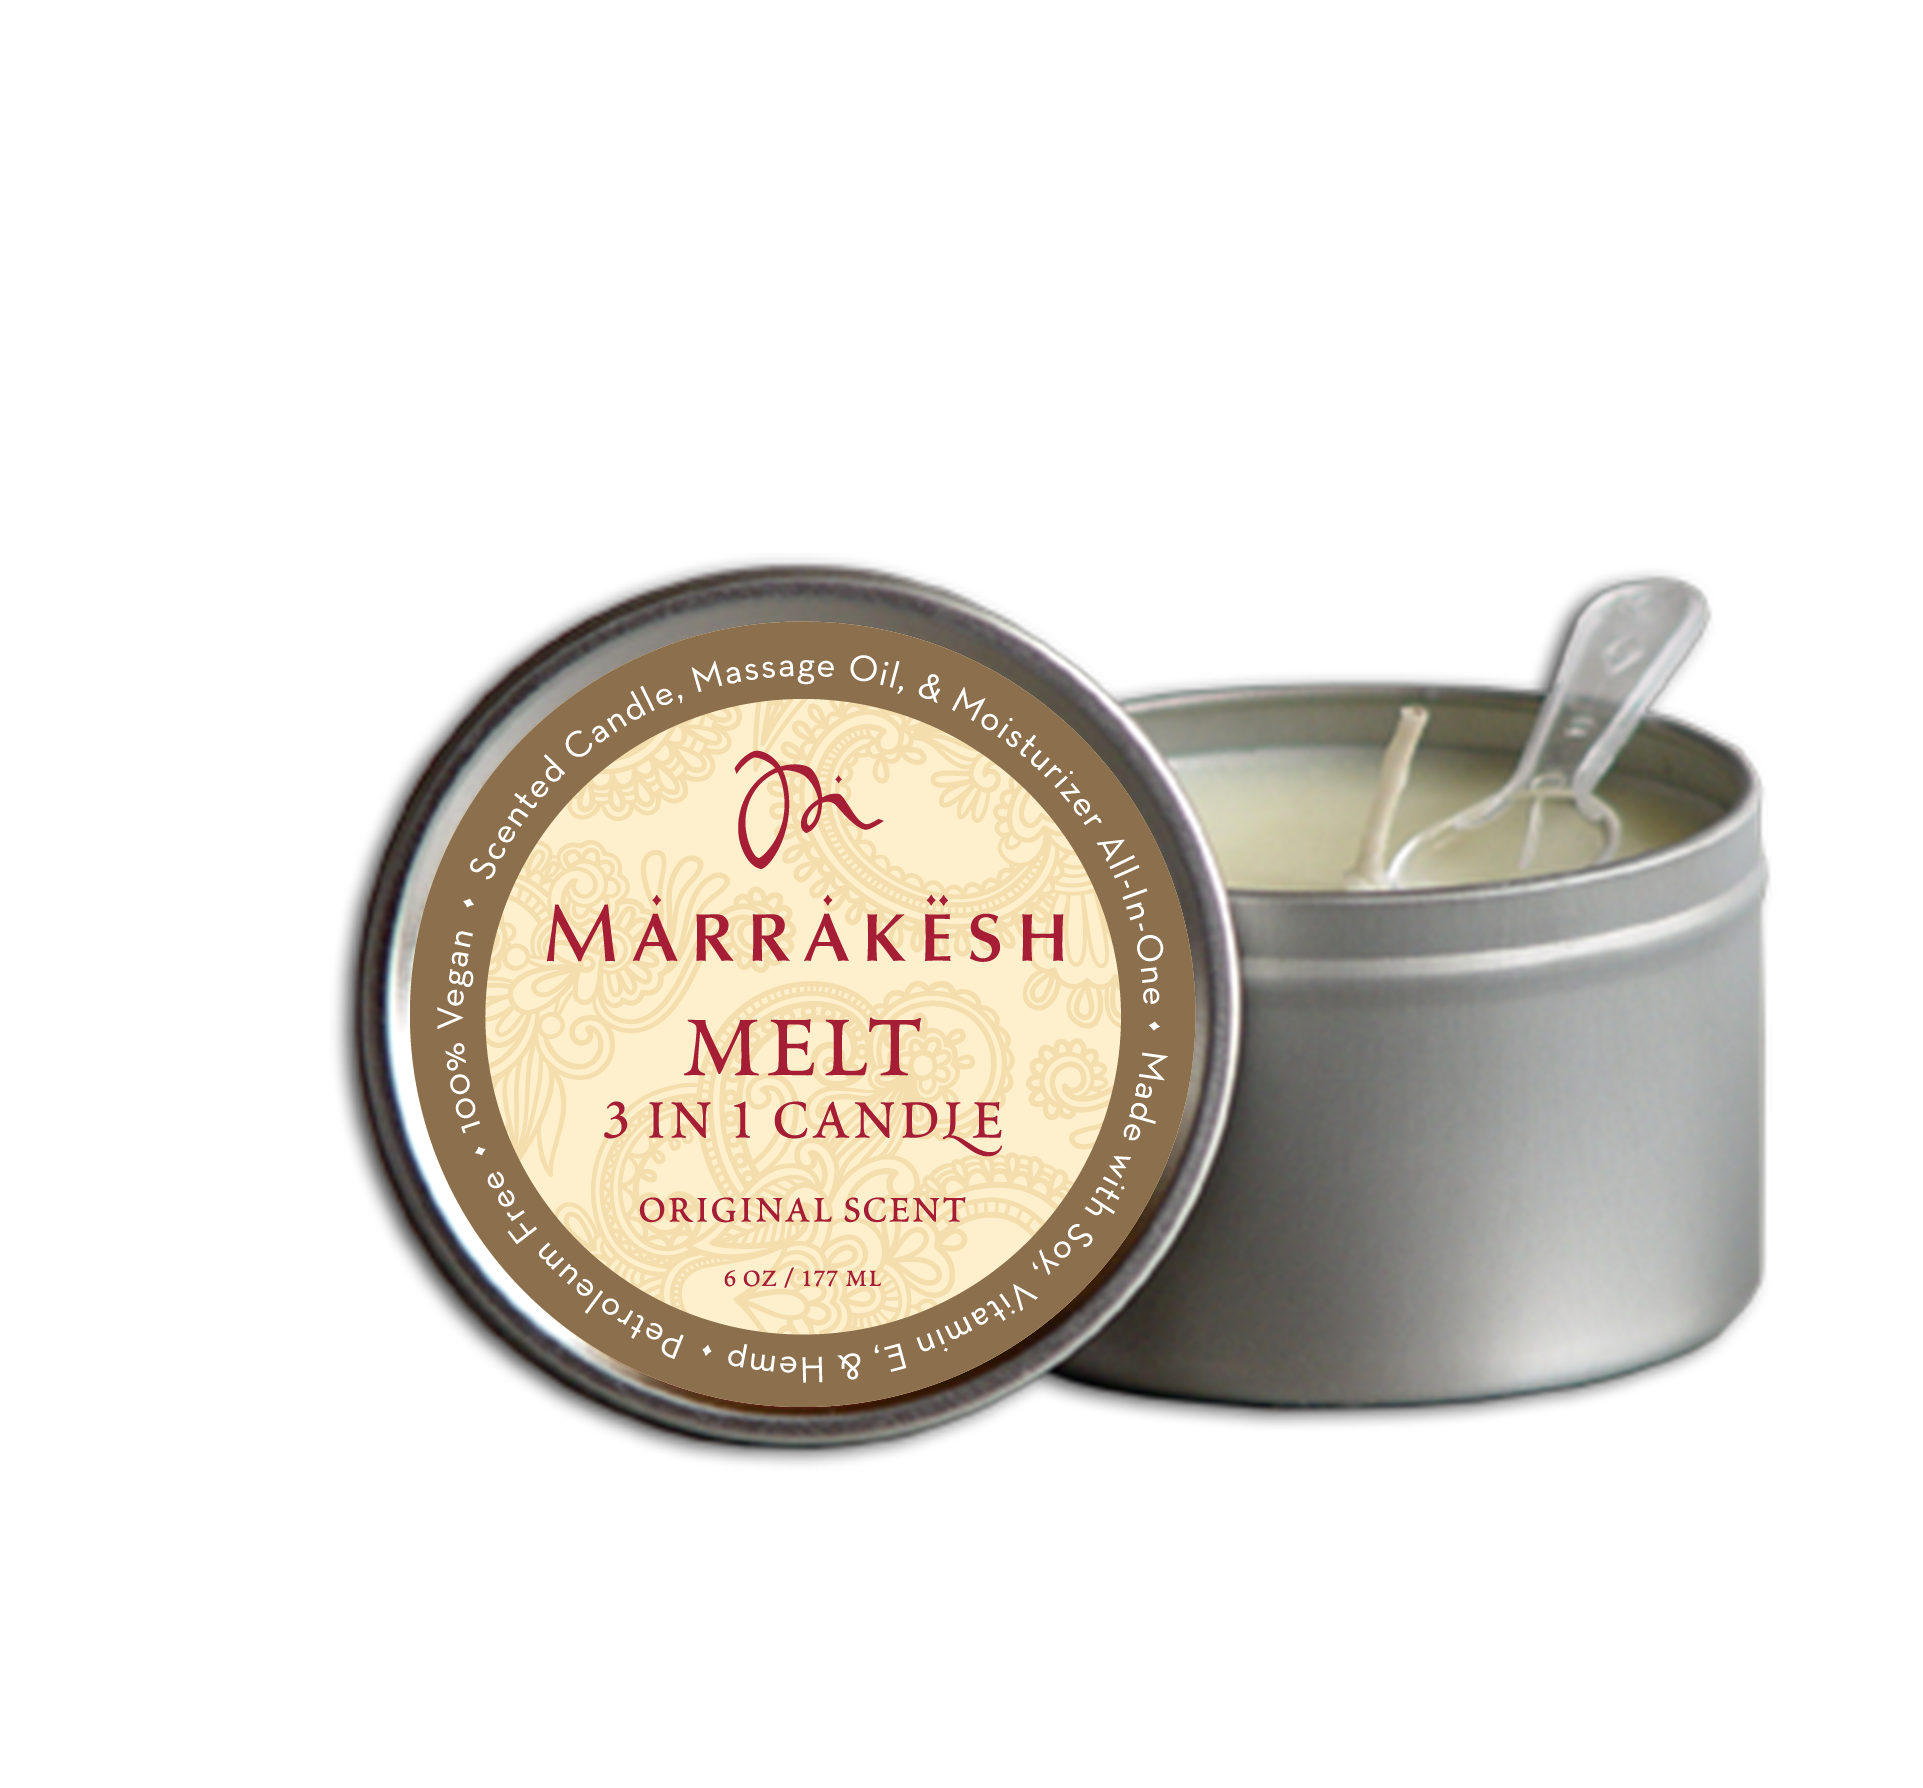 MARRAKESH Свеча 3 в 1 для тела (аромат Original) / Marrakesh 3 IN 1 Candle MELT ORIGINAL 180 мл